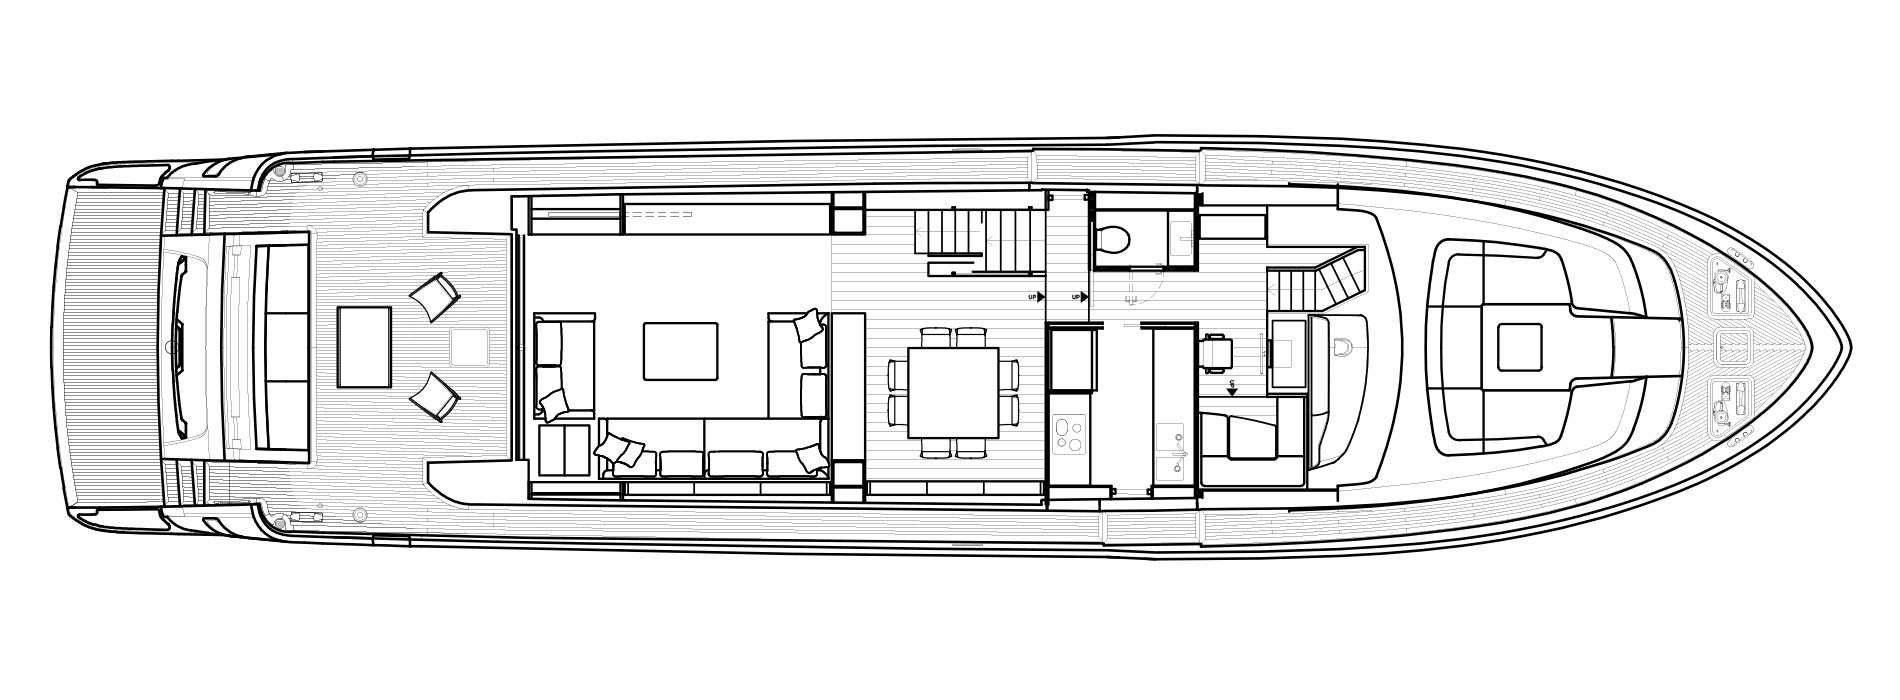 Sanlorenzo Yachts SL86 主甲板 Versione A